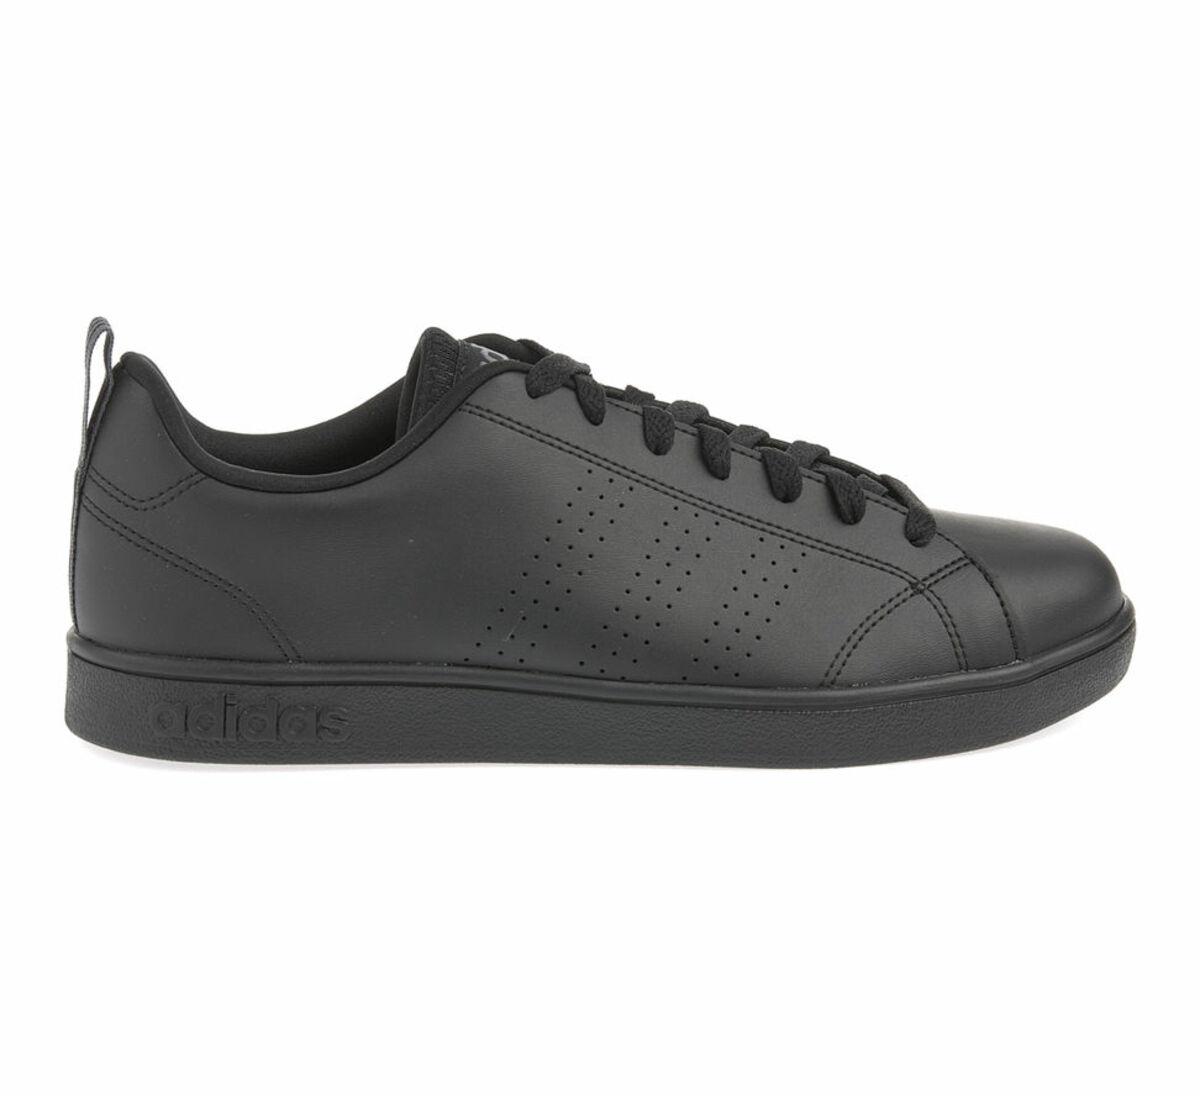 Bild 3 von adidas Sneaker - VS ADVANTAGE CL